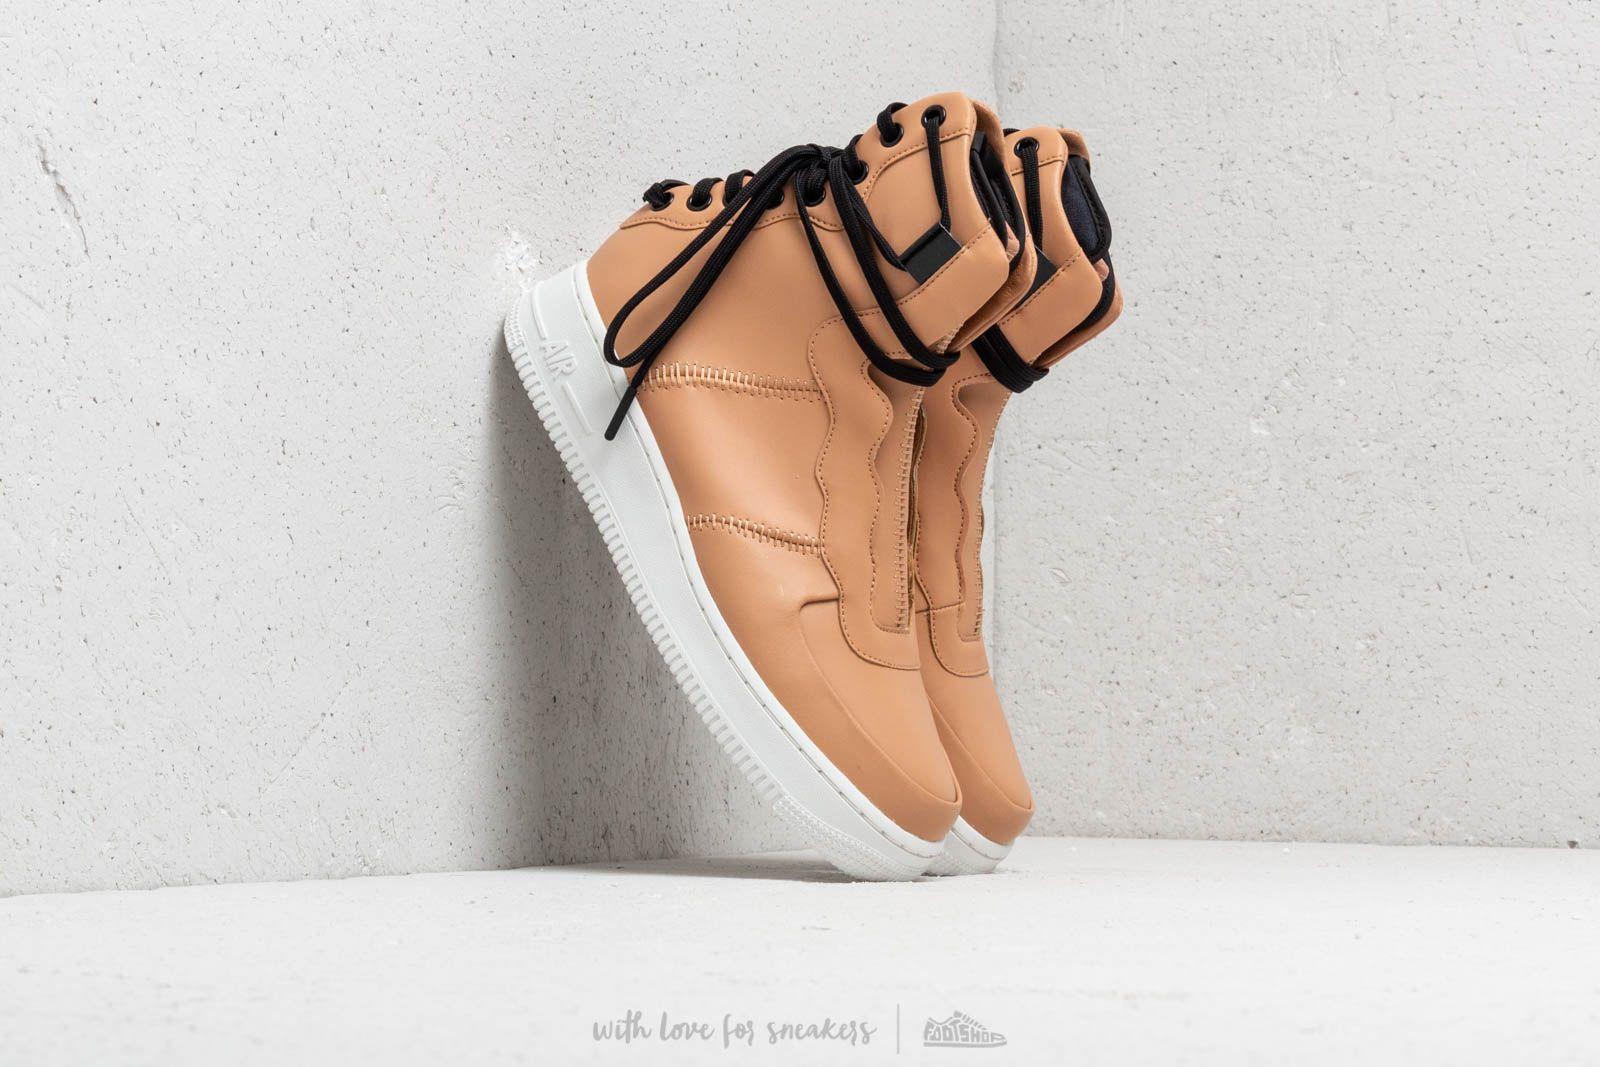 Nike Wmns Air Force 1 Rebel XX Praline/ Black Summit/ White za skvělou cenu 2 274 Kč koupíte na Footshop.cz